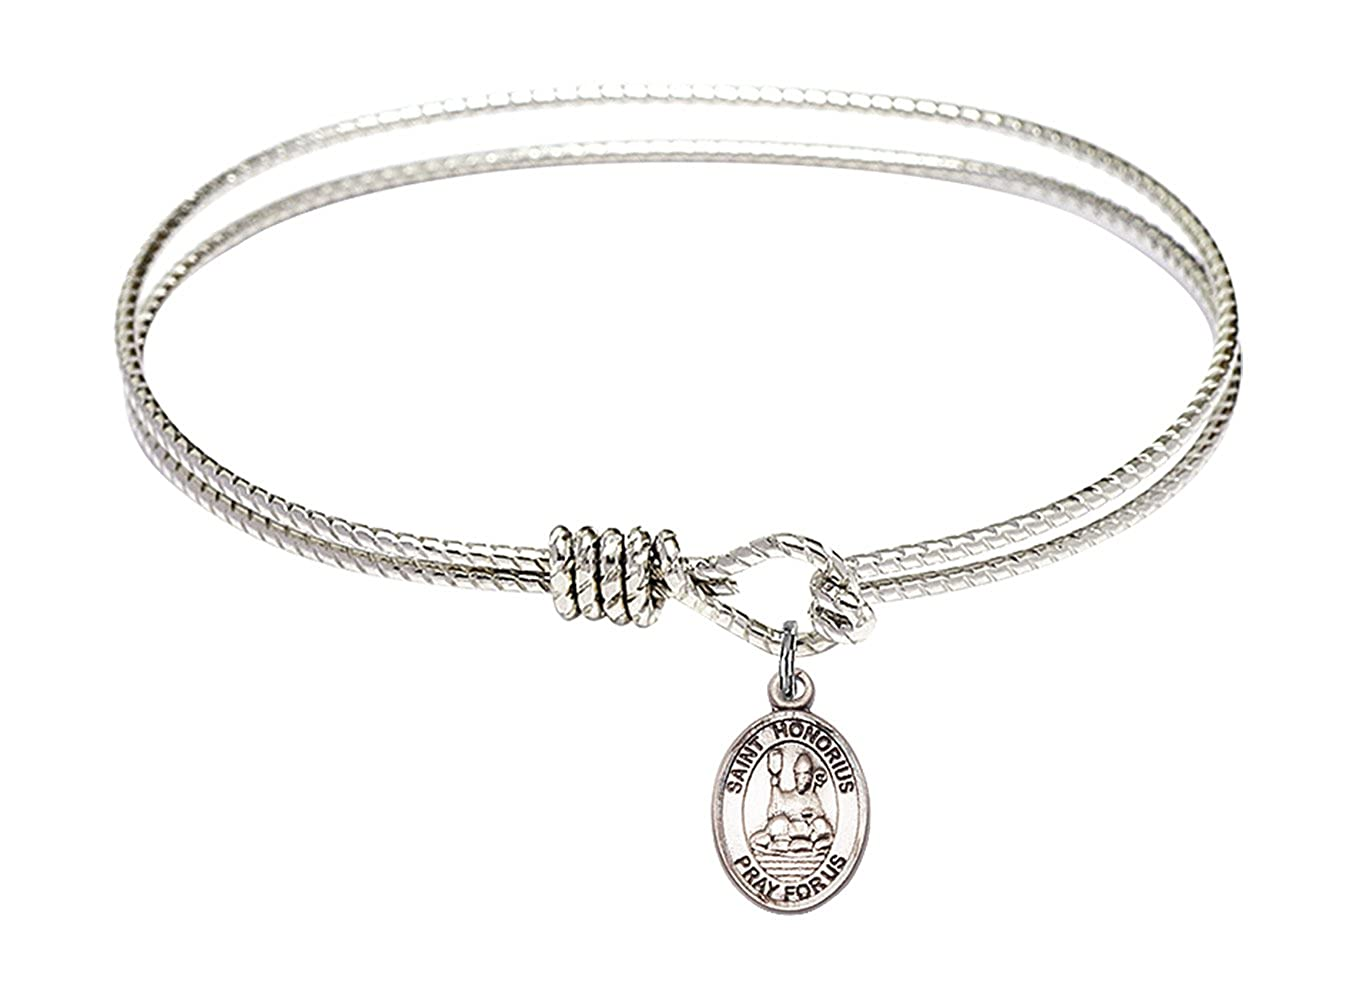 Honorius of Amiens Charm. DiamondJewelryNY Eye Hook Bangle Bracelet with a St